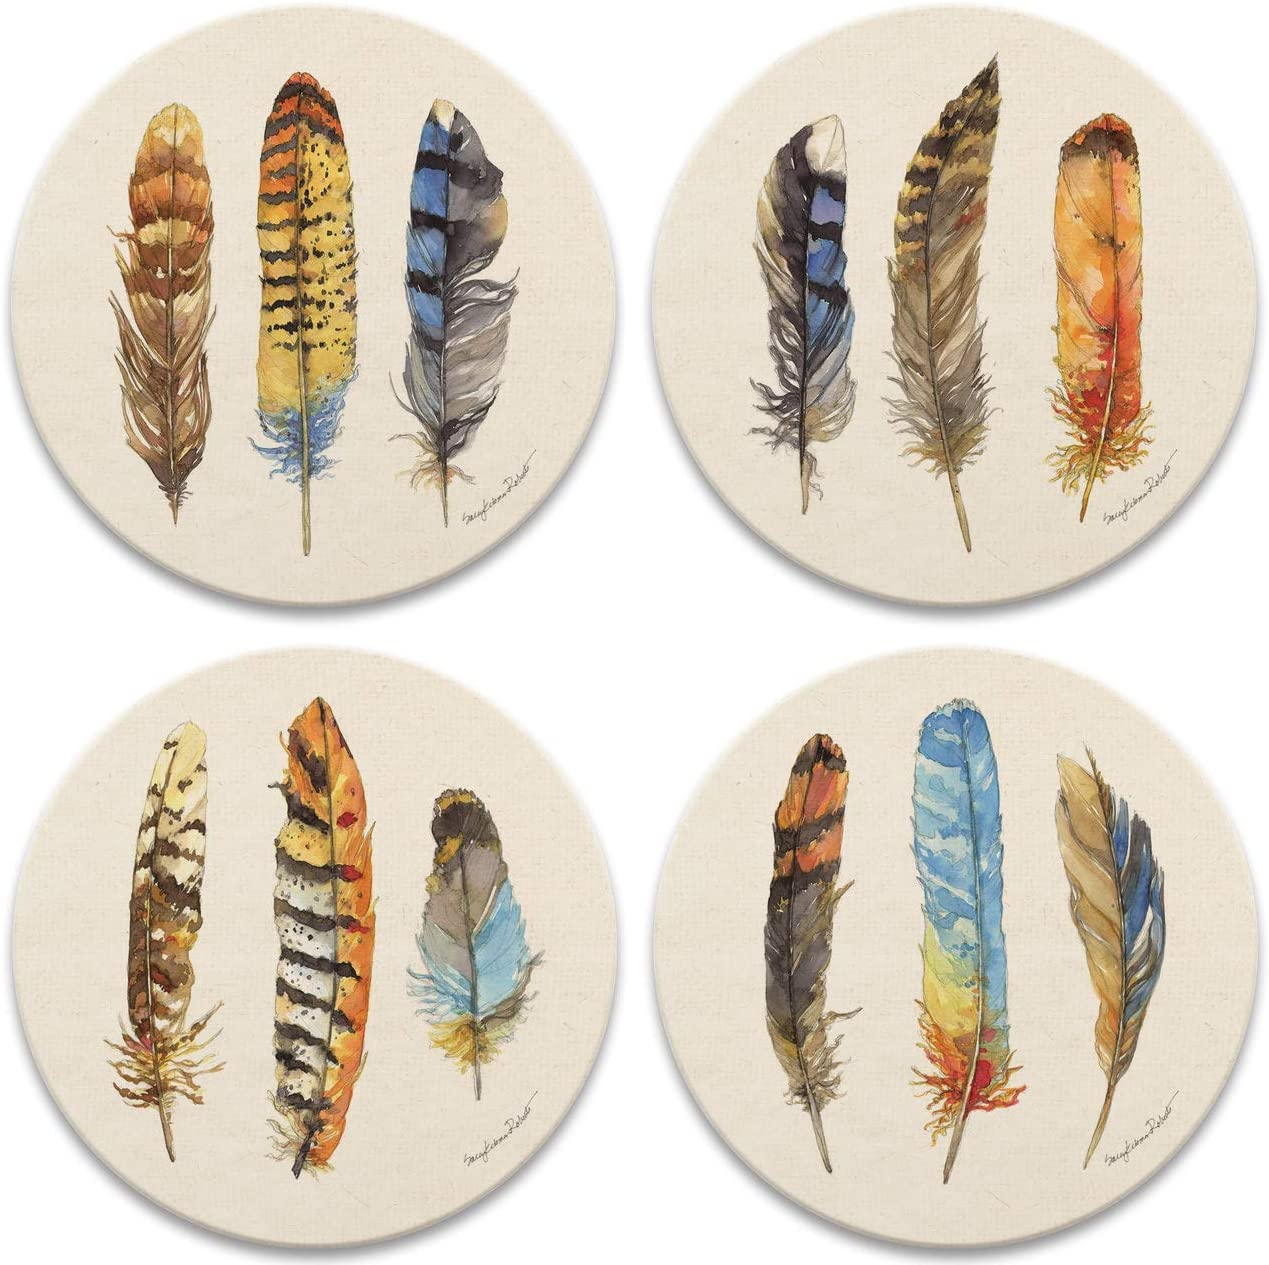 NEW Thirstystone Ikat Feathers Coaster Set Of 4